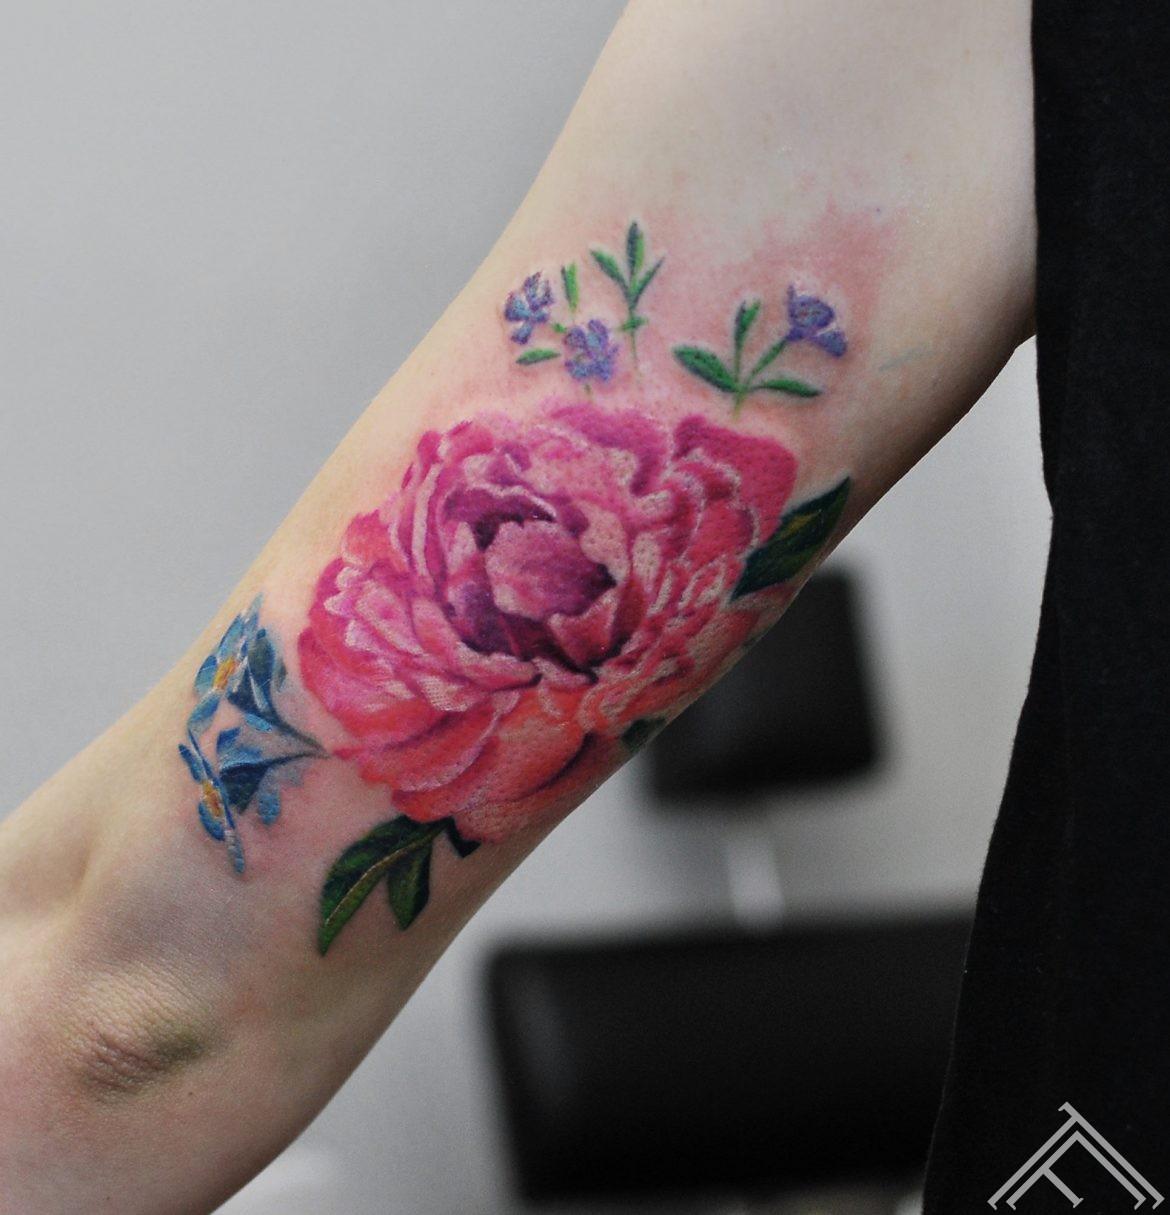 flower-zieds-puke-tetovejums-tattoo-tattoofrequency-riga-latvija-studija-salons-tetovesana